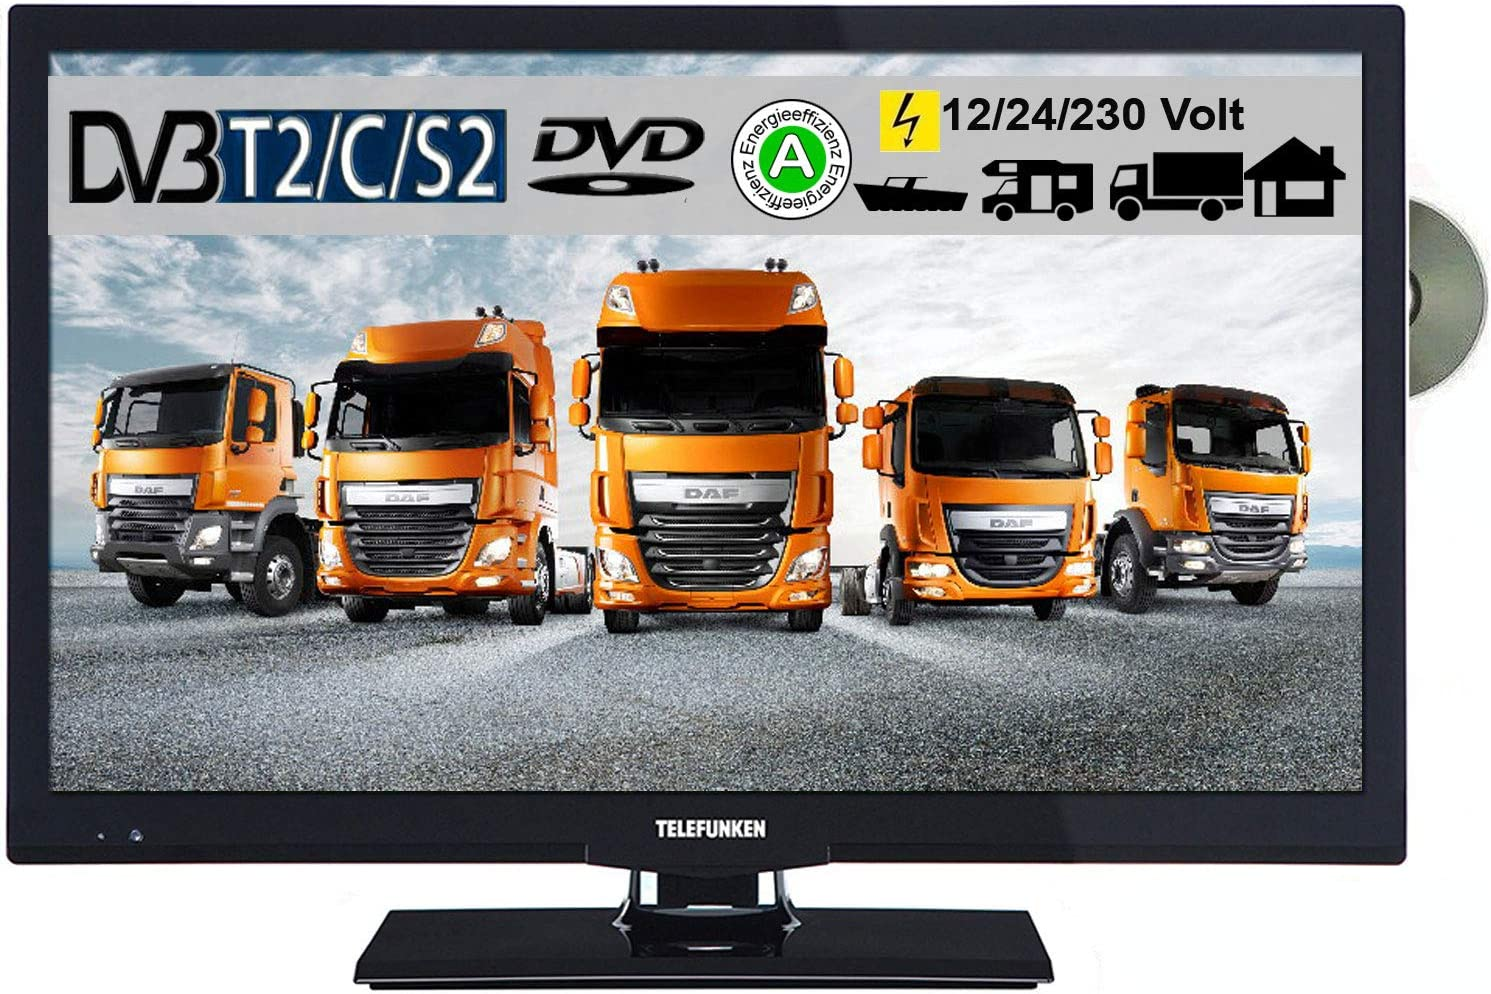 Telefunken l22 F275 X 3 LED TV de 22 Pulgadas 55 cm TV con DVD DVB-S/S2, DVB-T, DVB-C, USB, Clase de eficiencia energética A, 230 V/12 V/24 V: Amazon.es: Electrónica